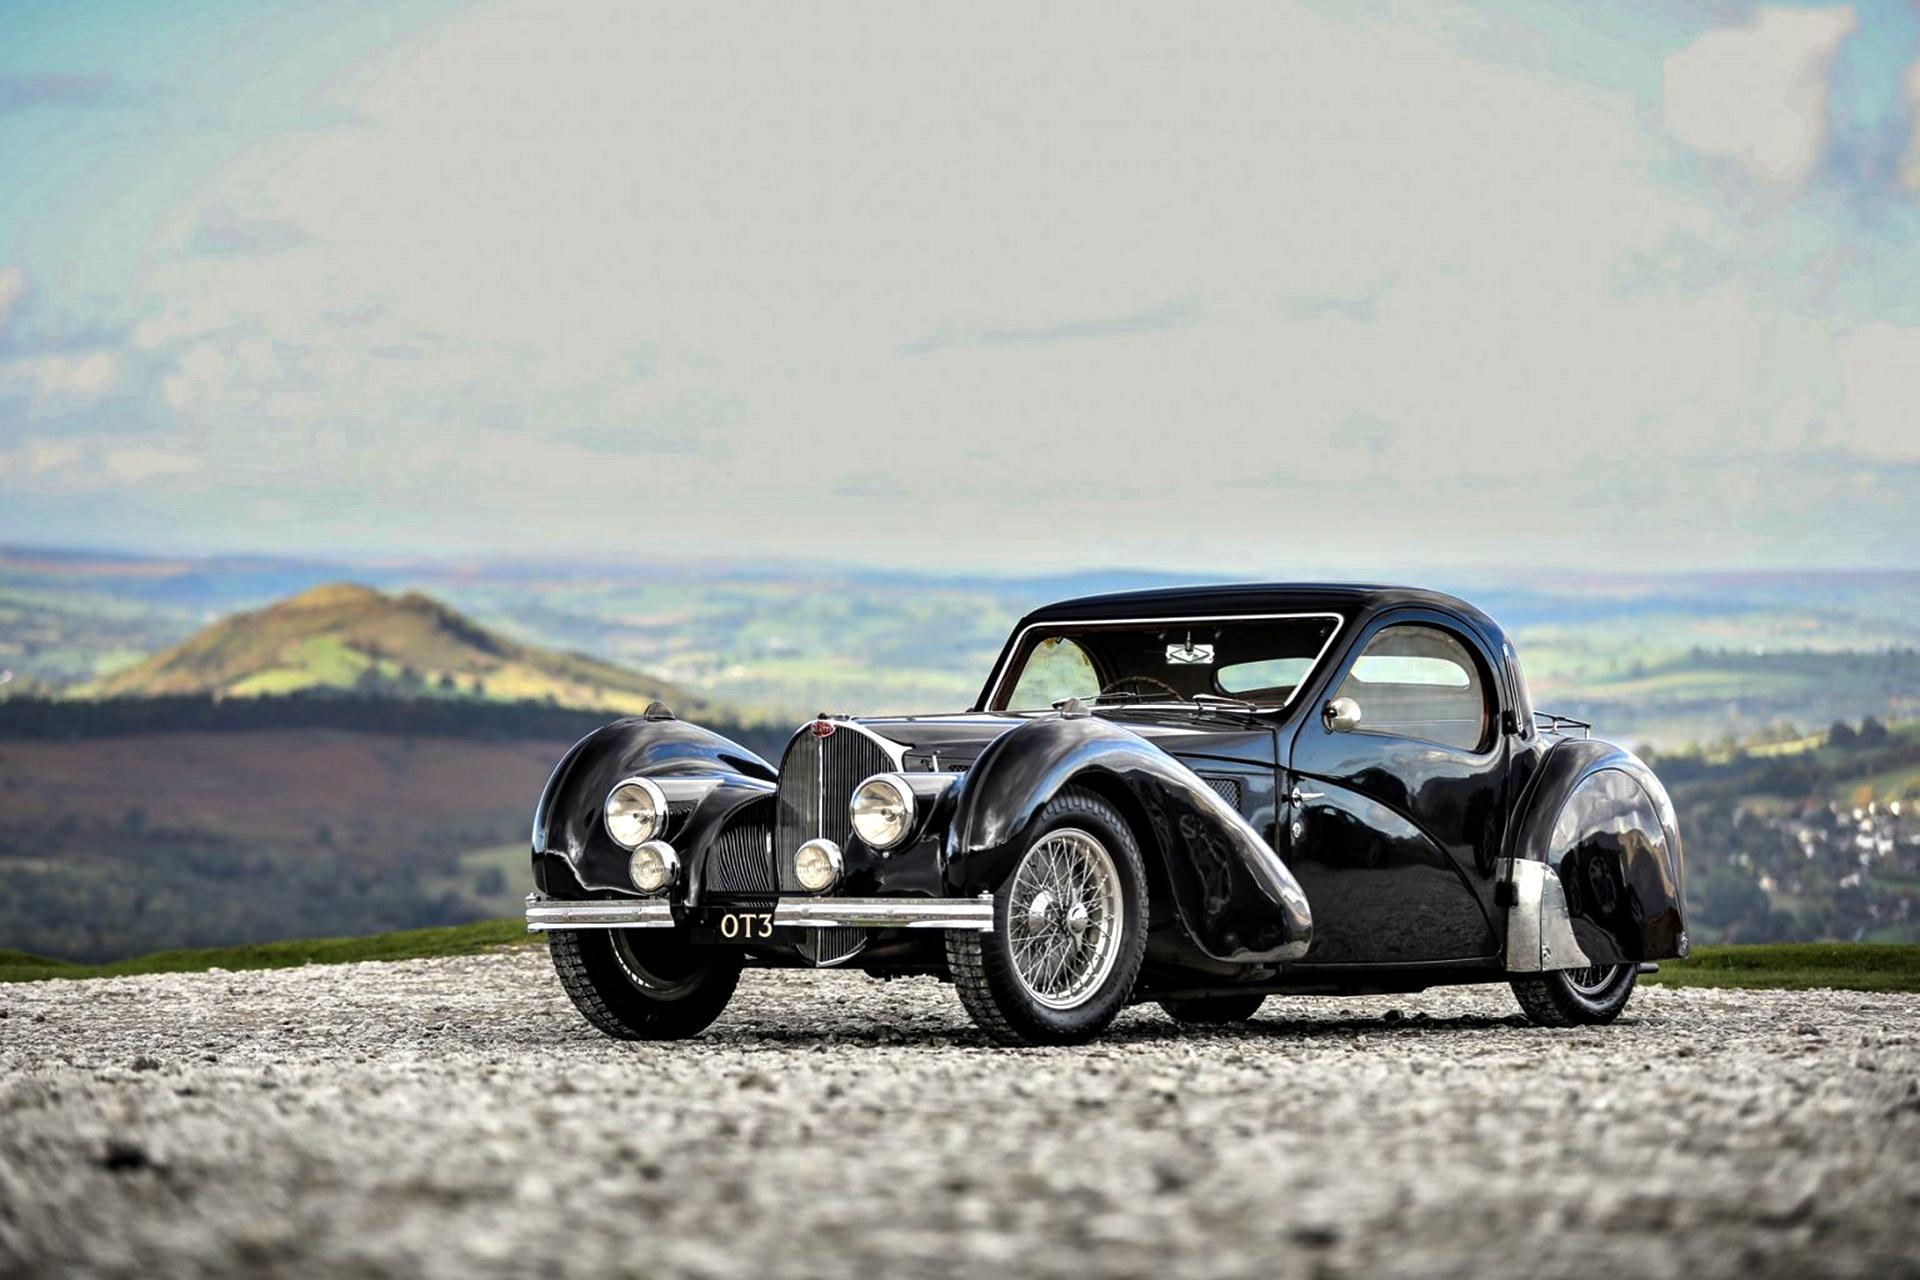 2. 1937 Bugatti Type 57s Atalante Gooding And Company Mathieu Heurtault